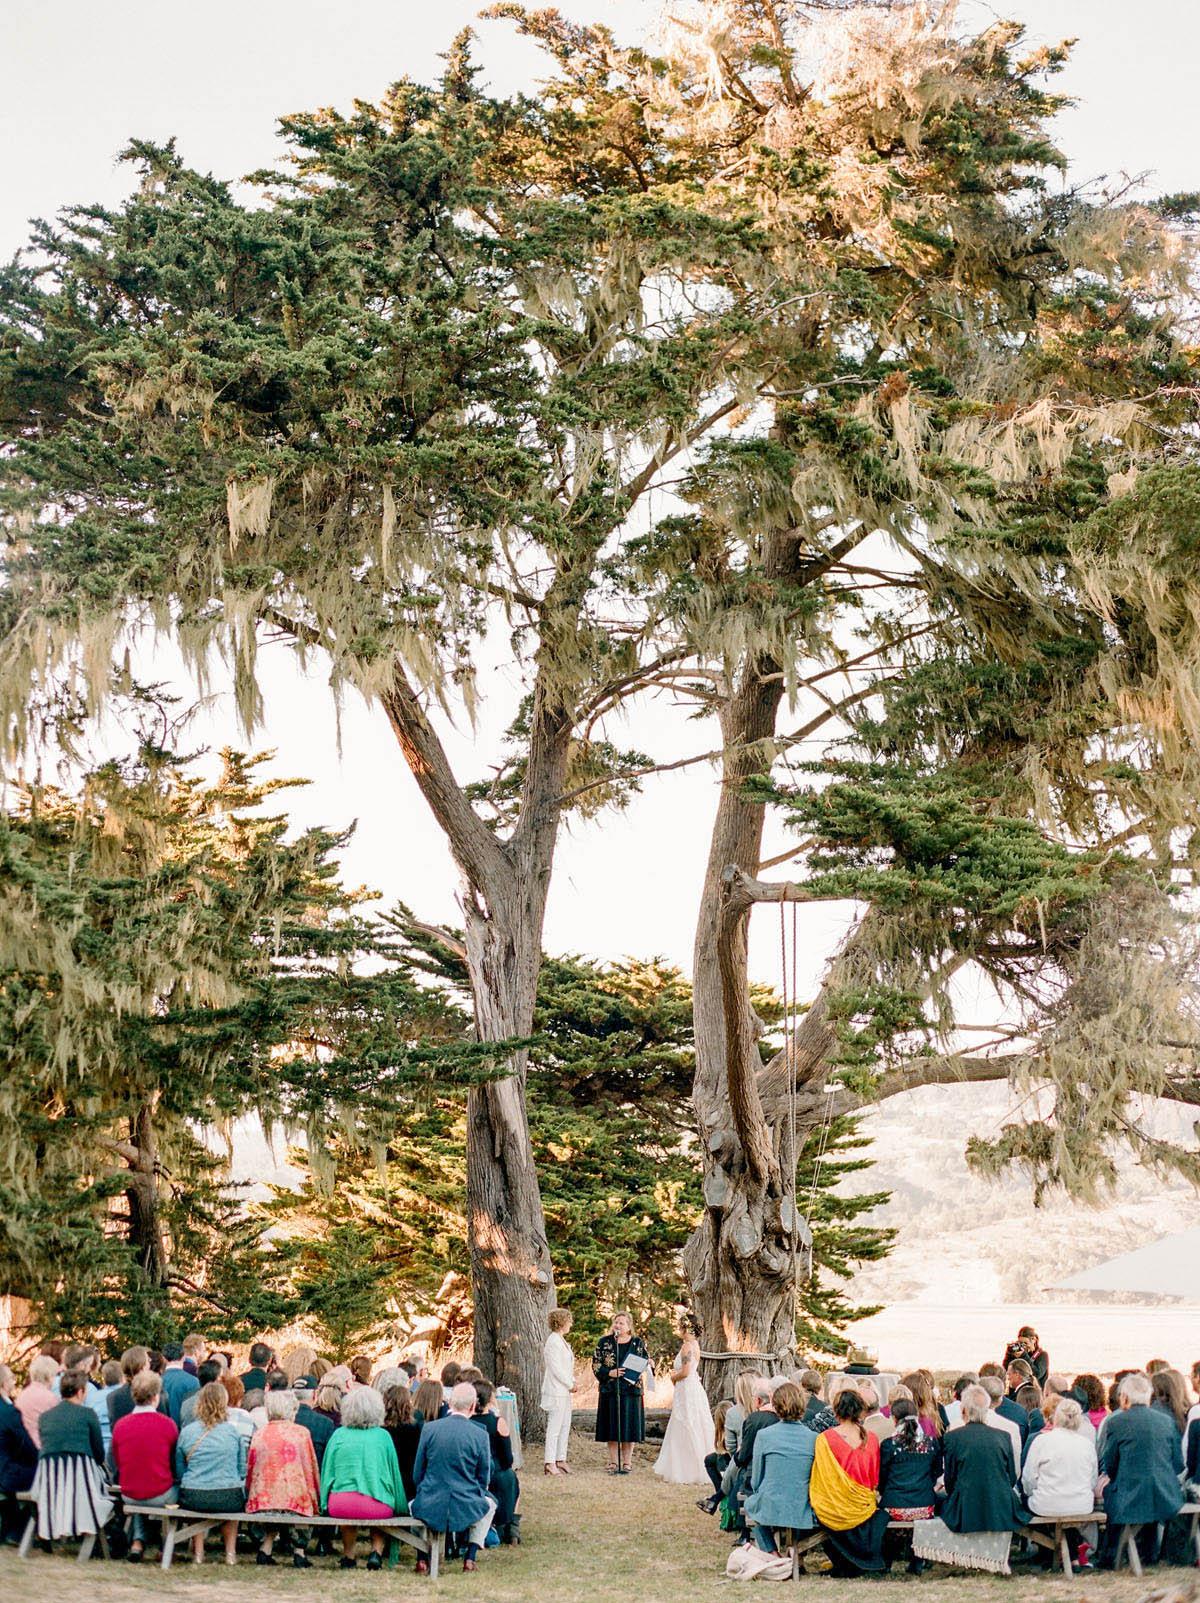 13-ceremony-under-tree.jpg